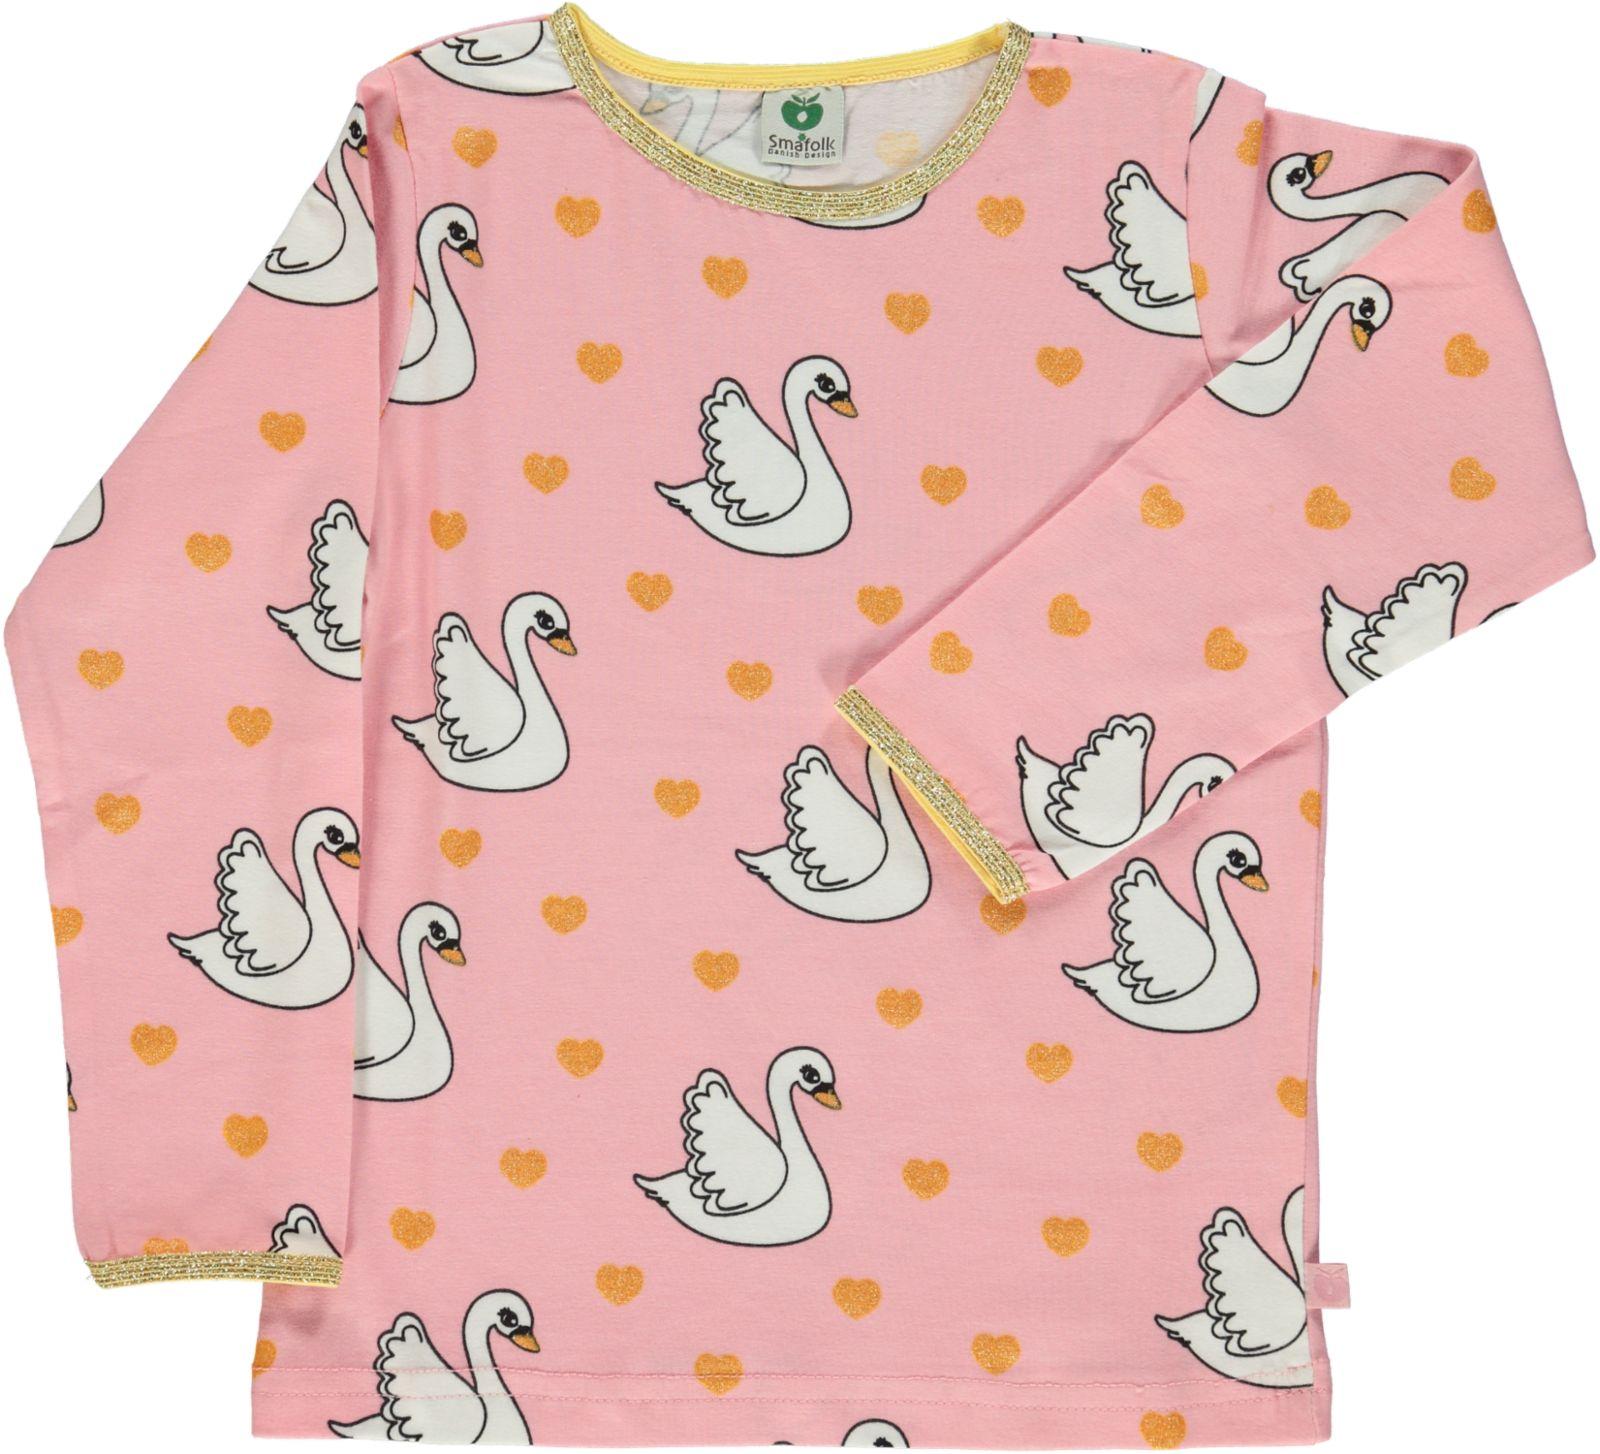 Småfolk - T-shirt w. Swan